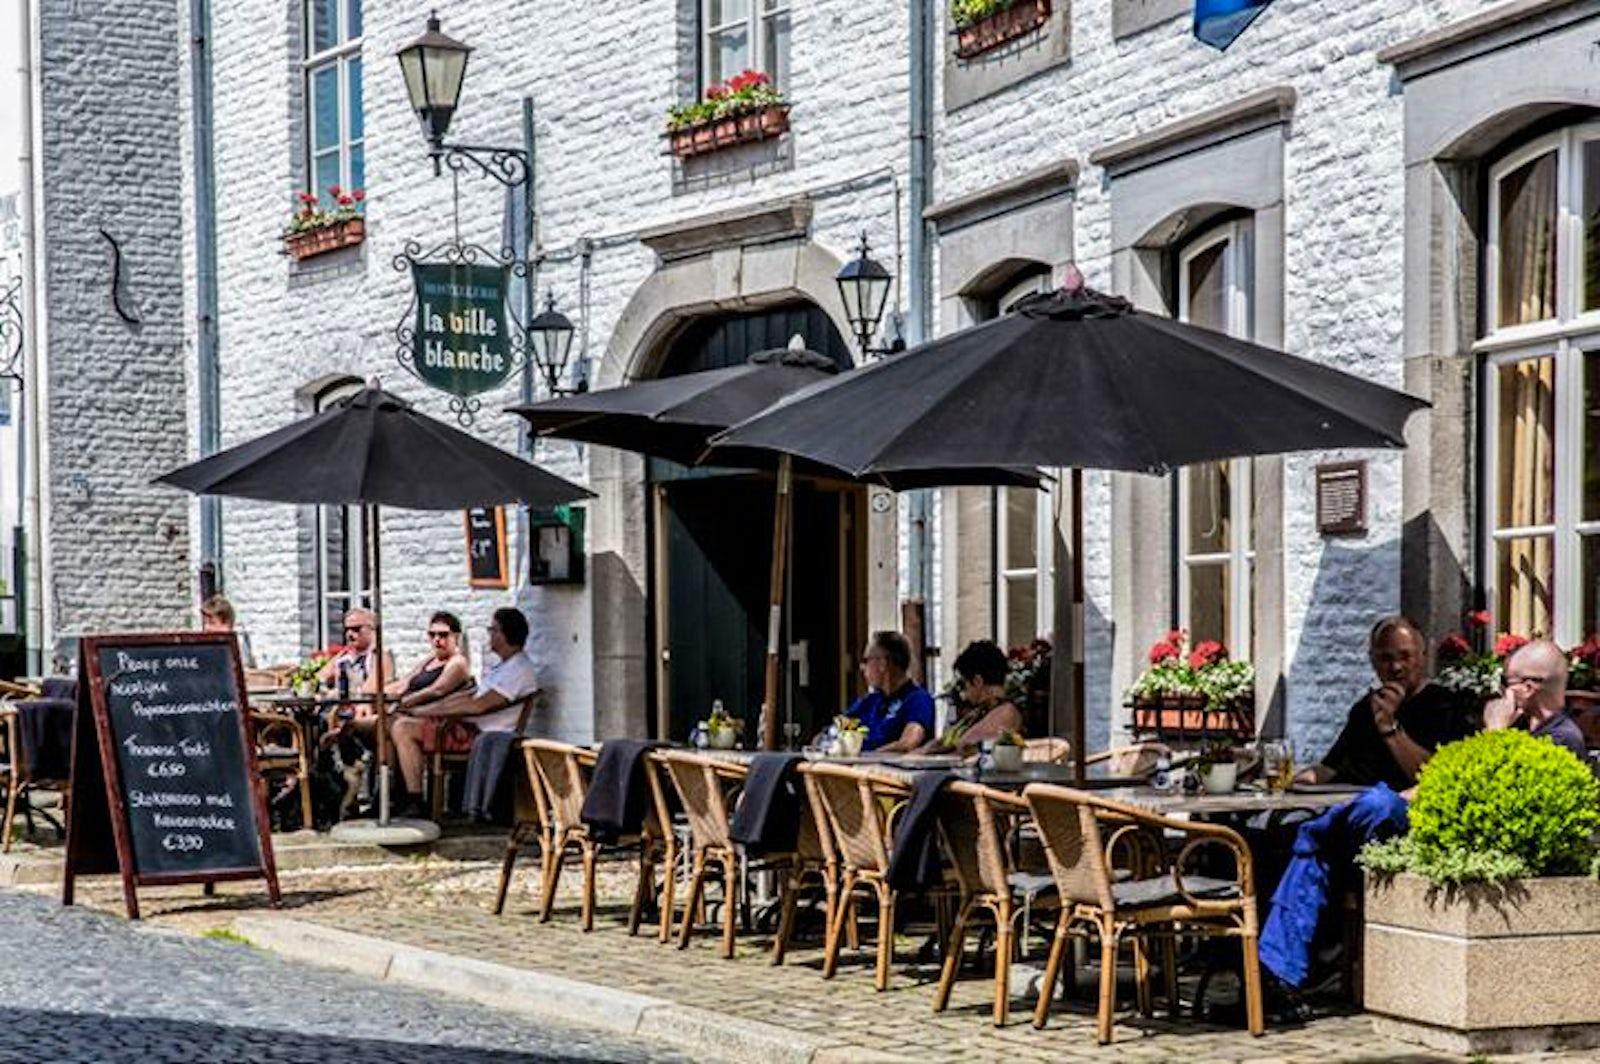 Fletcher Hotel-Restaurant La Ville Blanche | itinari